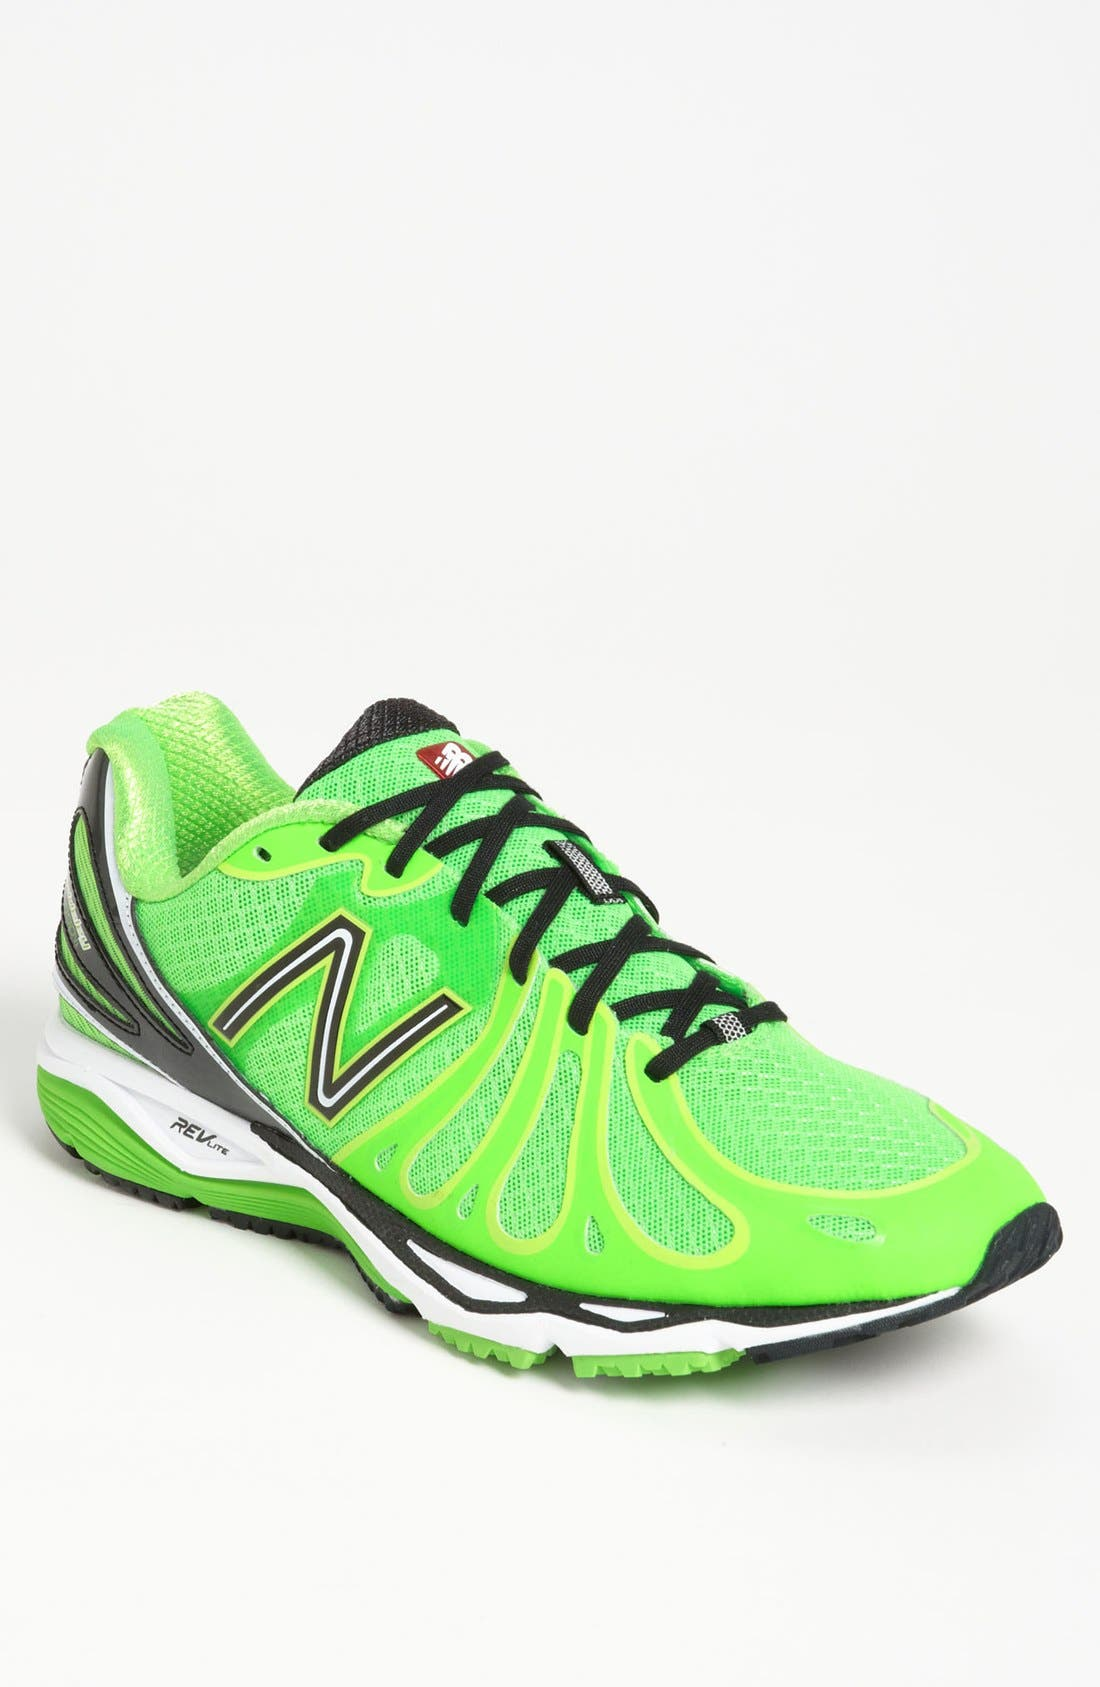 Main Image - New Balance '890v3' Running Shoe (Men) (Online Only)